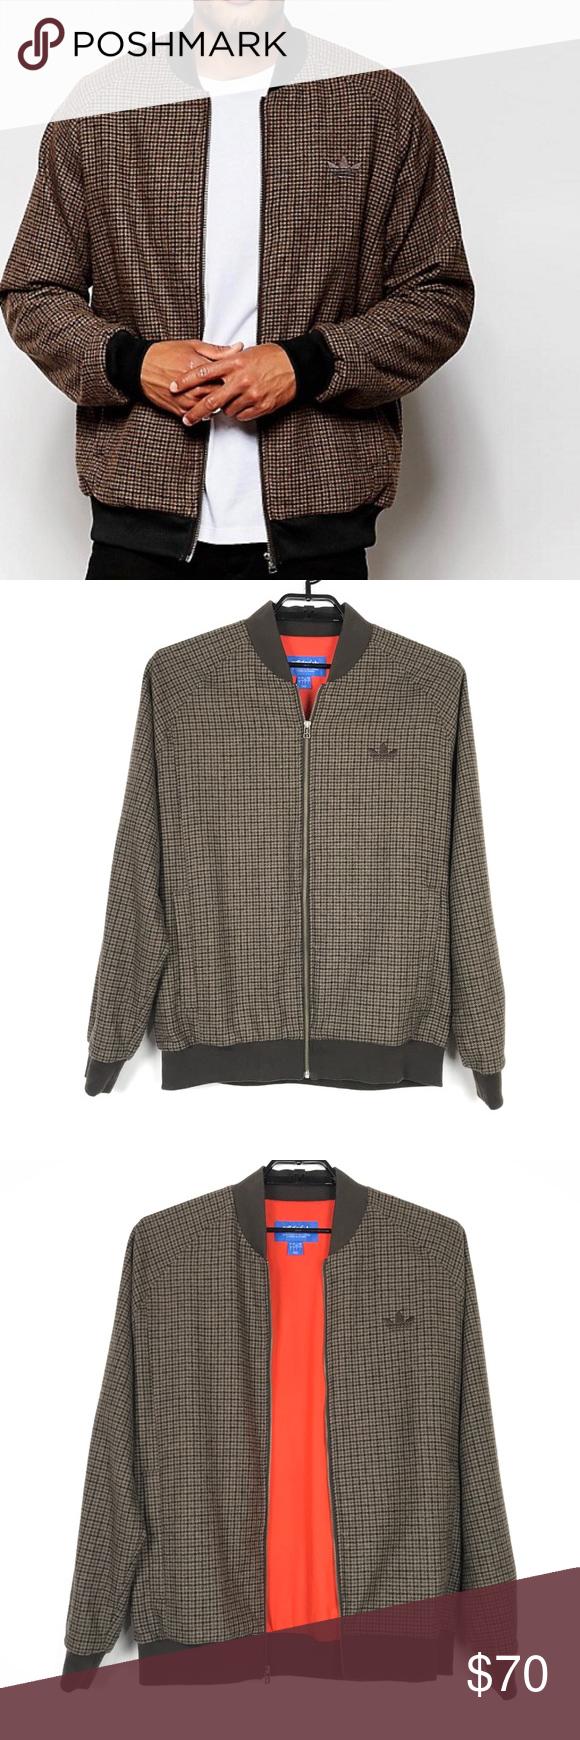 Adidas Originals Tweed Bomber Jacket Sz Lg Brown Clothes Design Adidas Originals Jacket Fashion [ 1740 x 580 Pixel ]